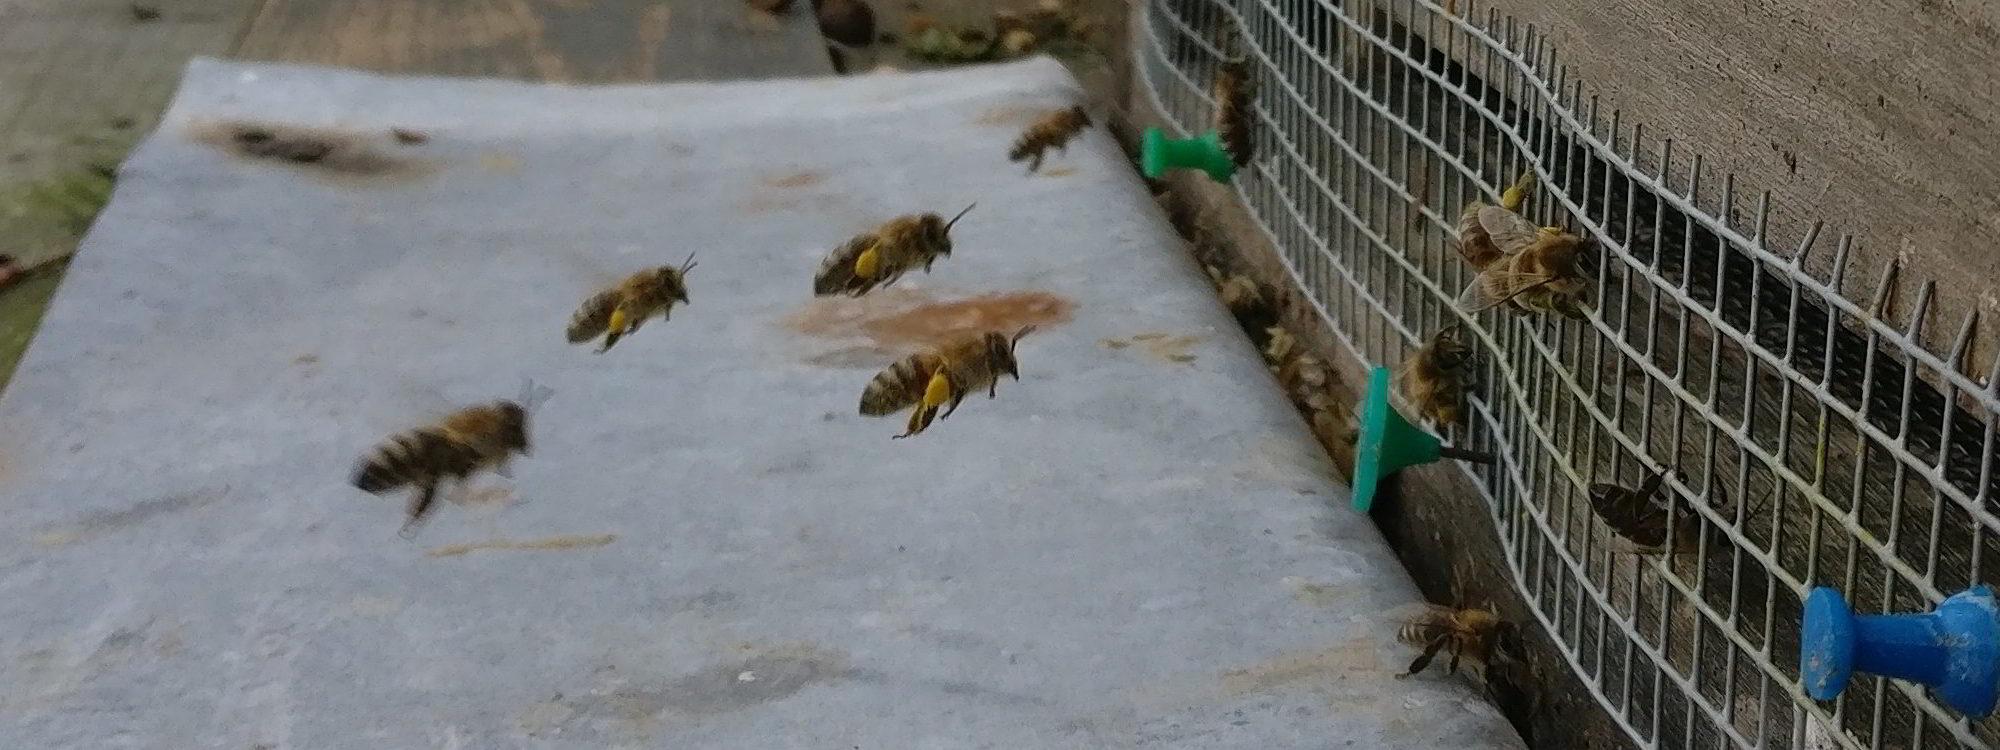 Pollenbeladene Bienen im Anflug